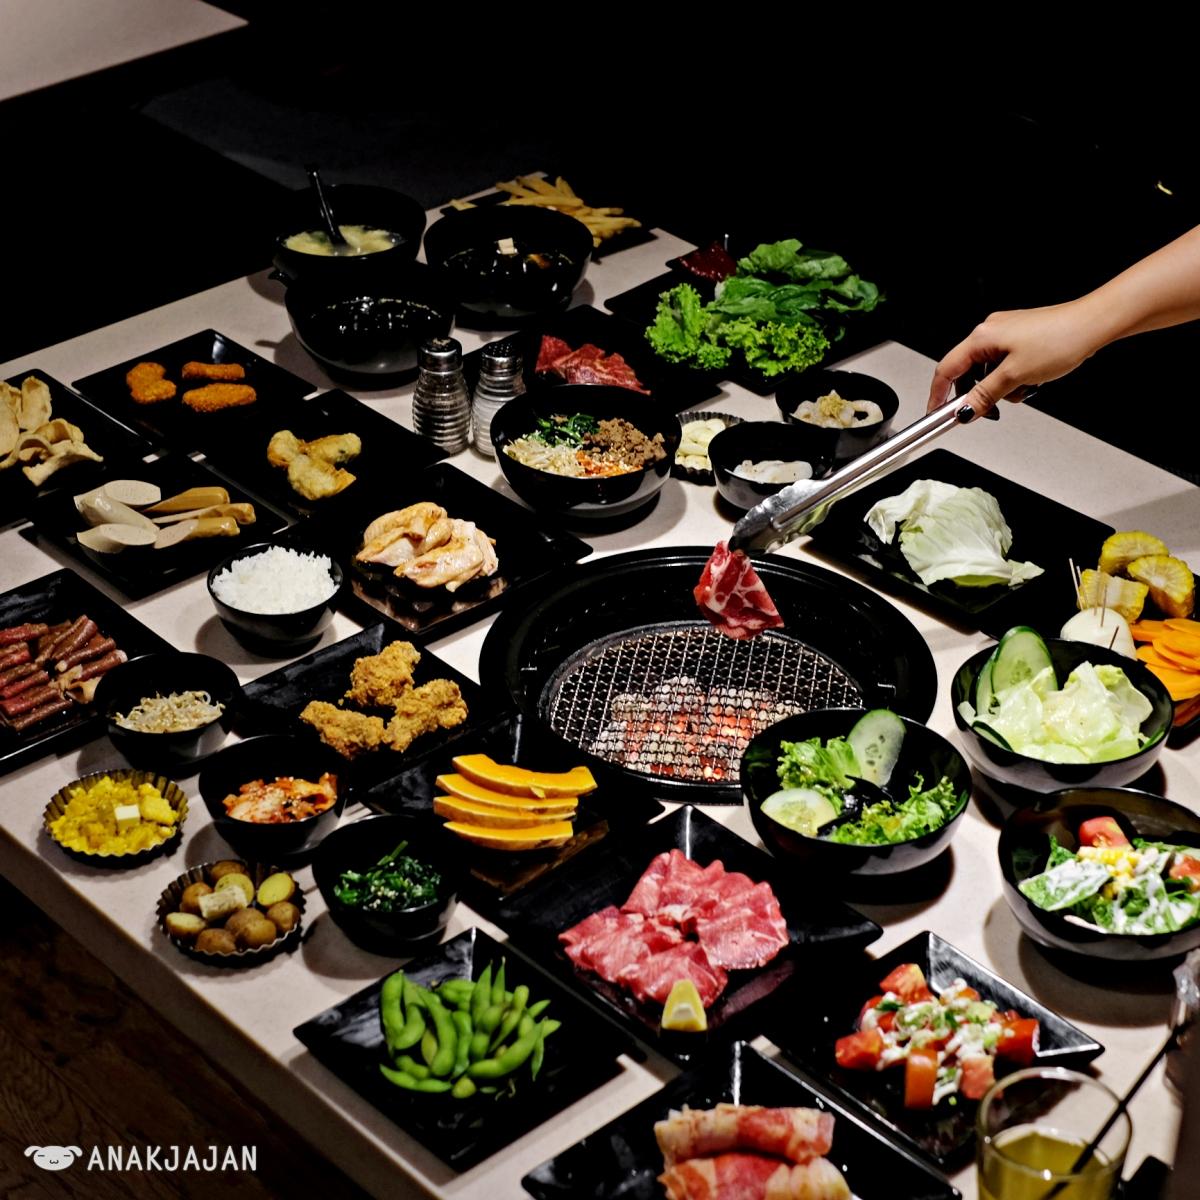 Neo Hotel Jogja: GYU-KAKU Japanese BBQ ALL YOU CAN EAT